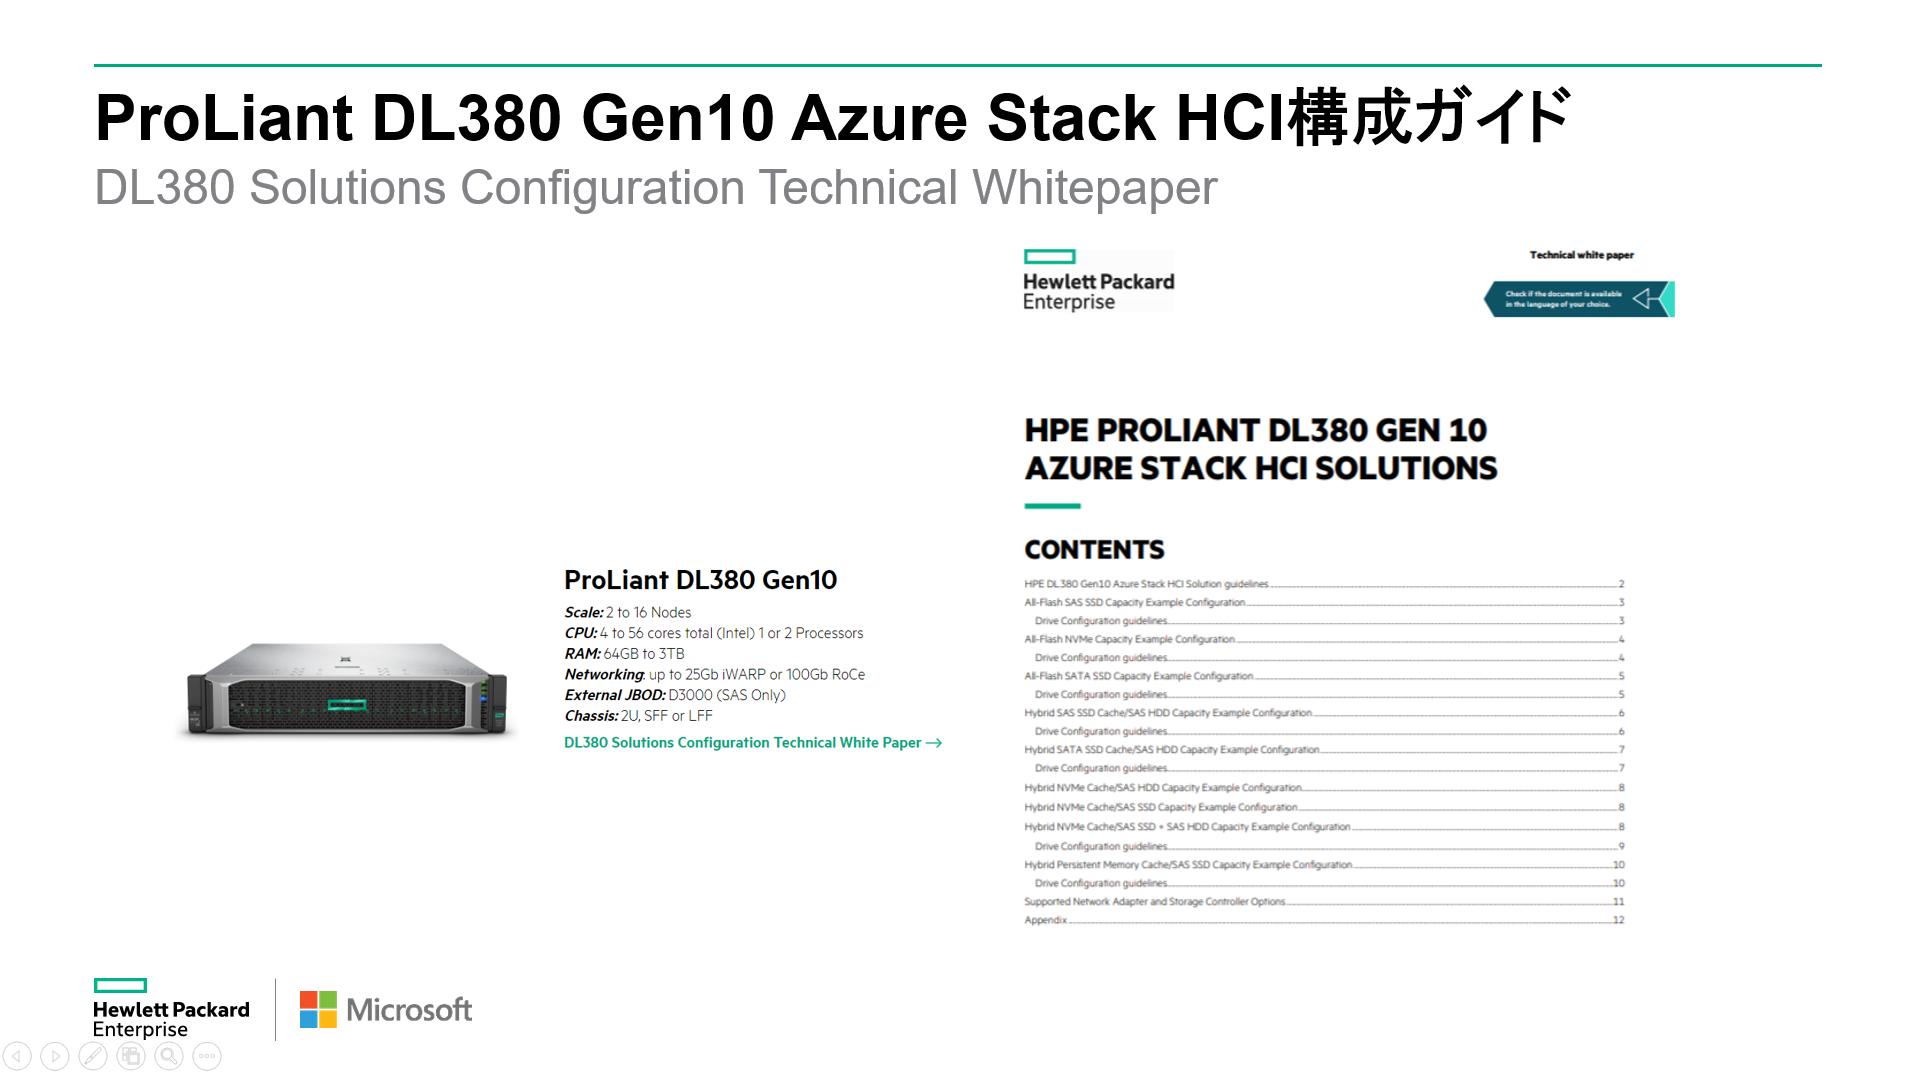 AzureStackHCI構成ガイド.PNG